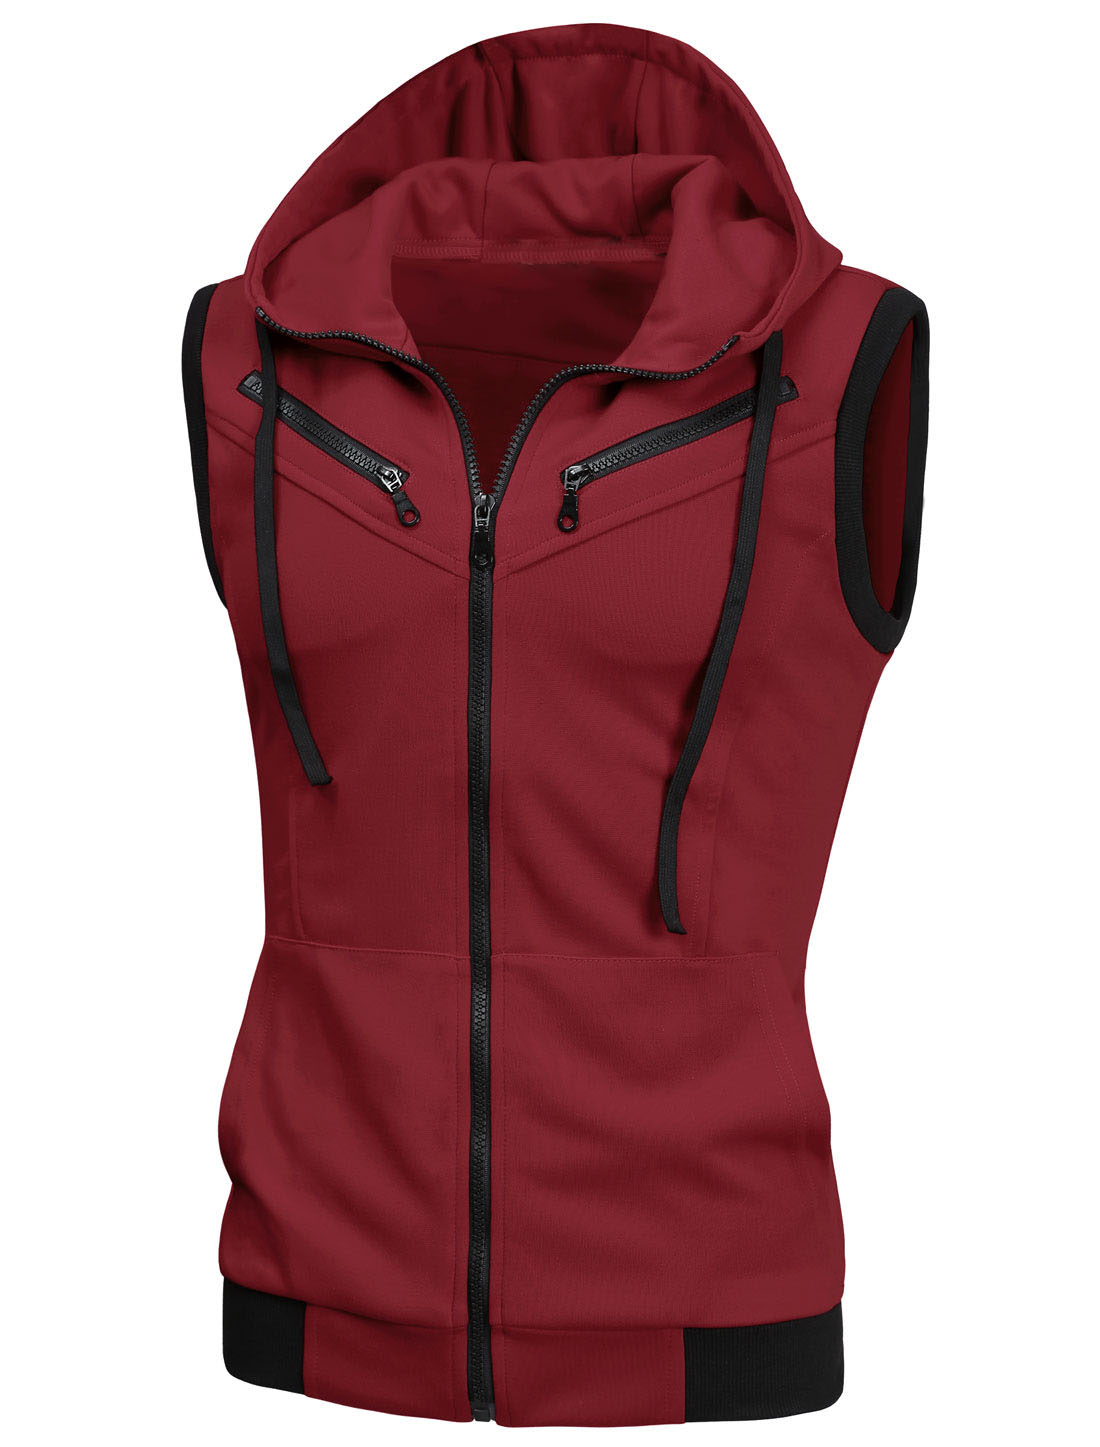 Men Zip Up Two Pockets Front Drawstring Hooded Vest Burgundy S